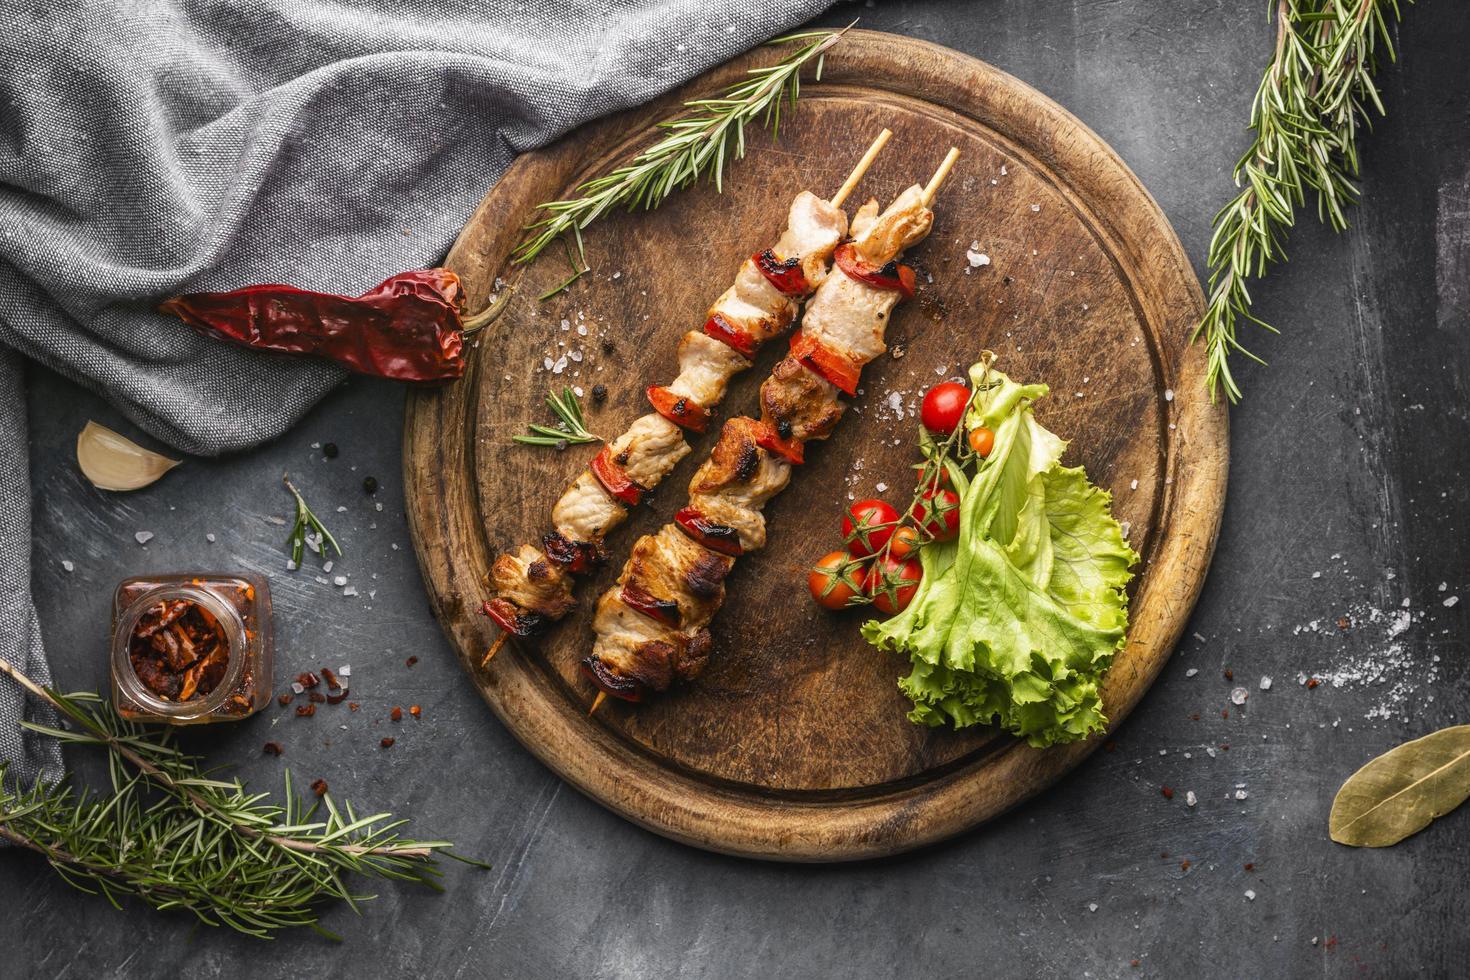 concepto de carne fresca laicos plana foto